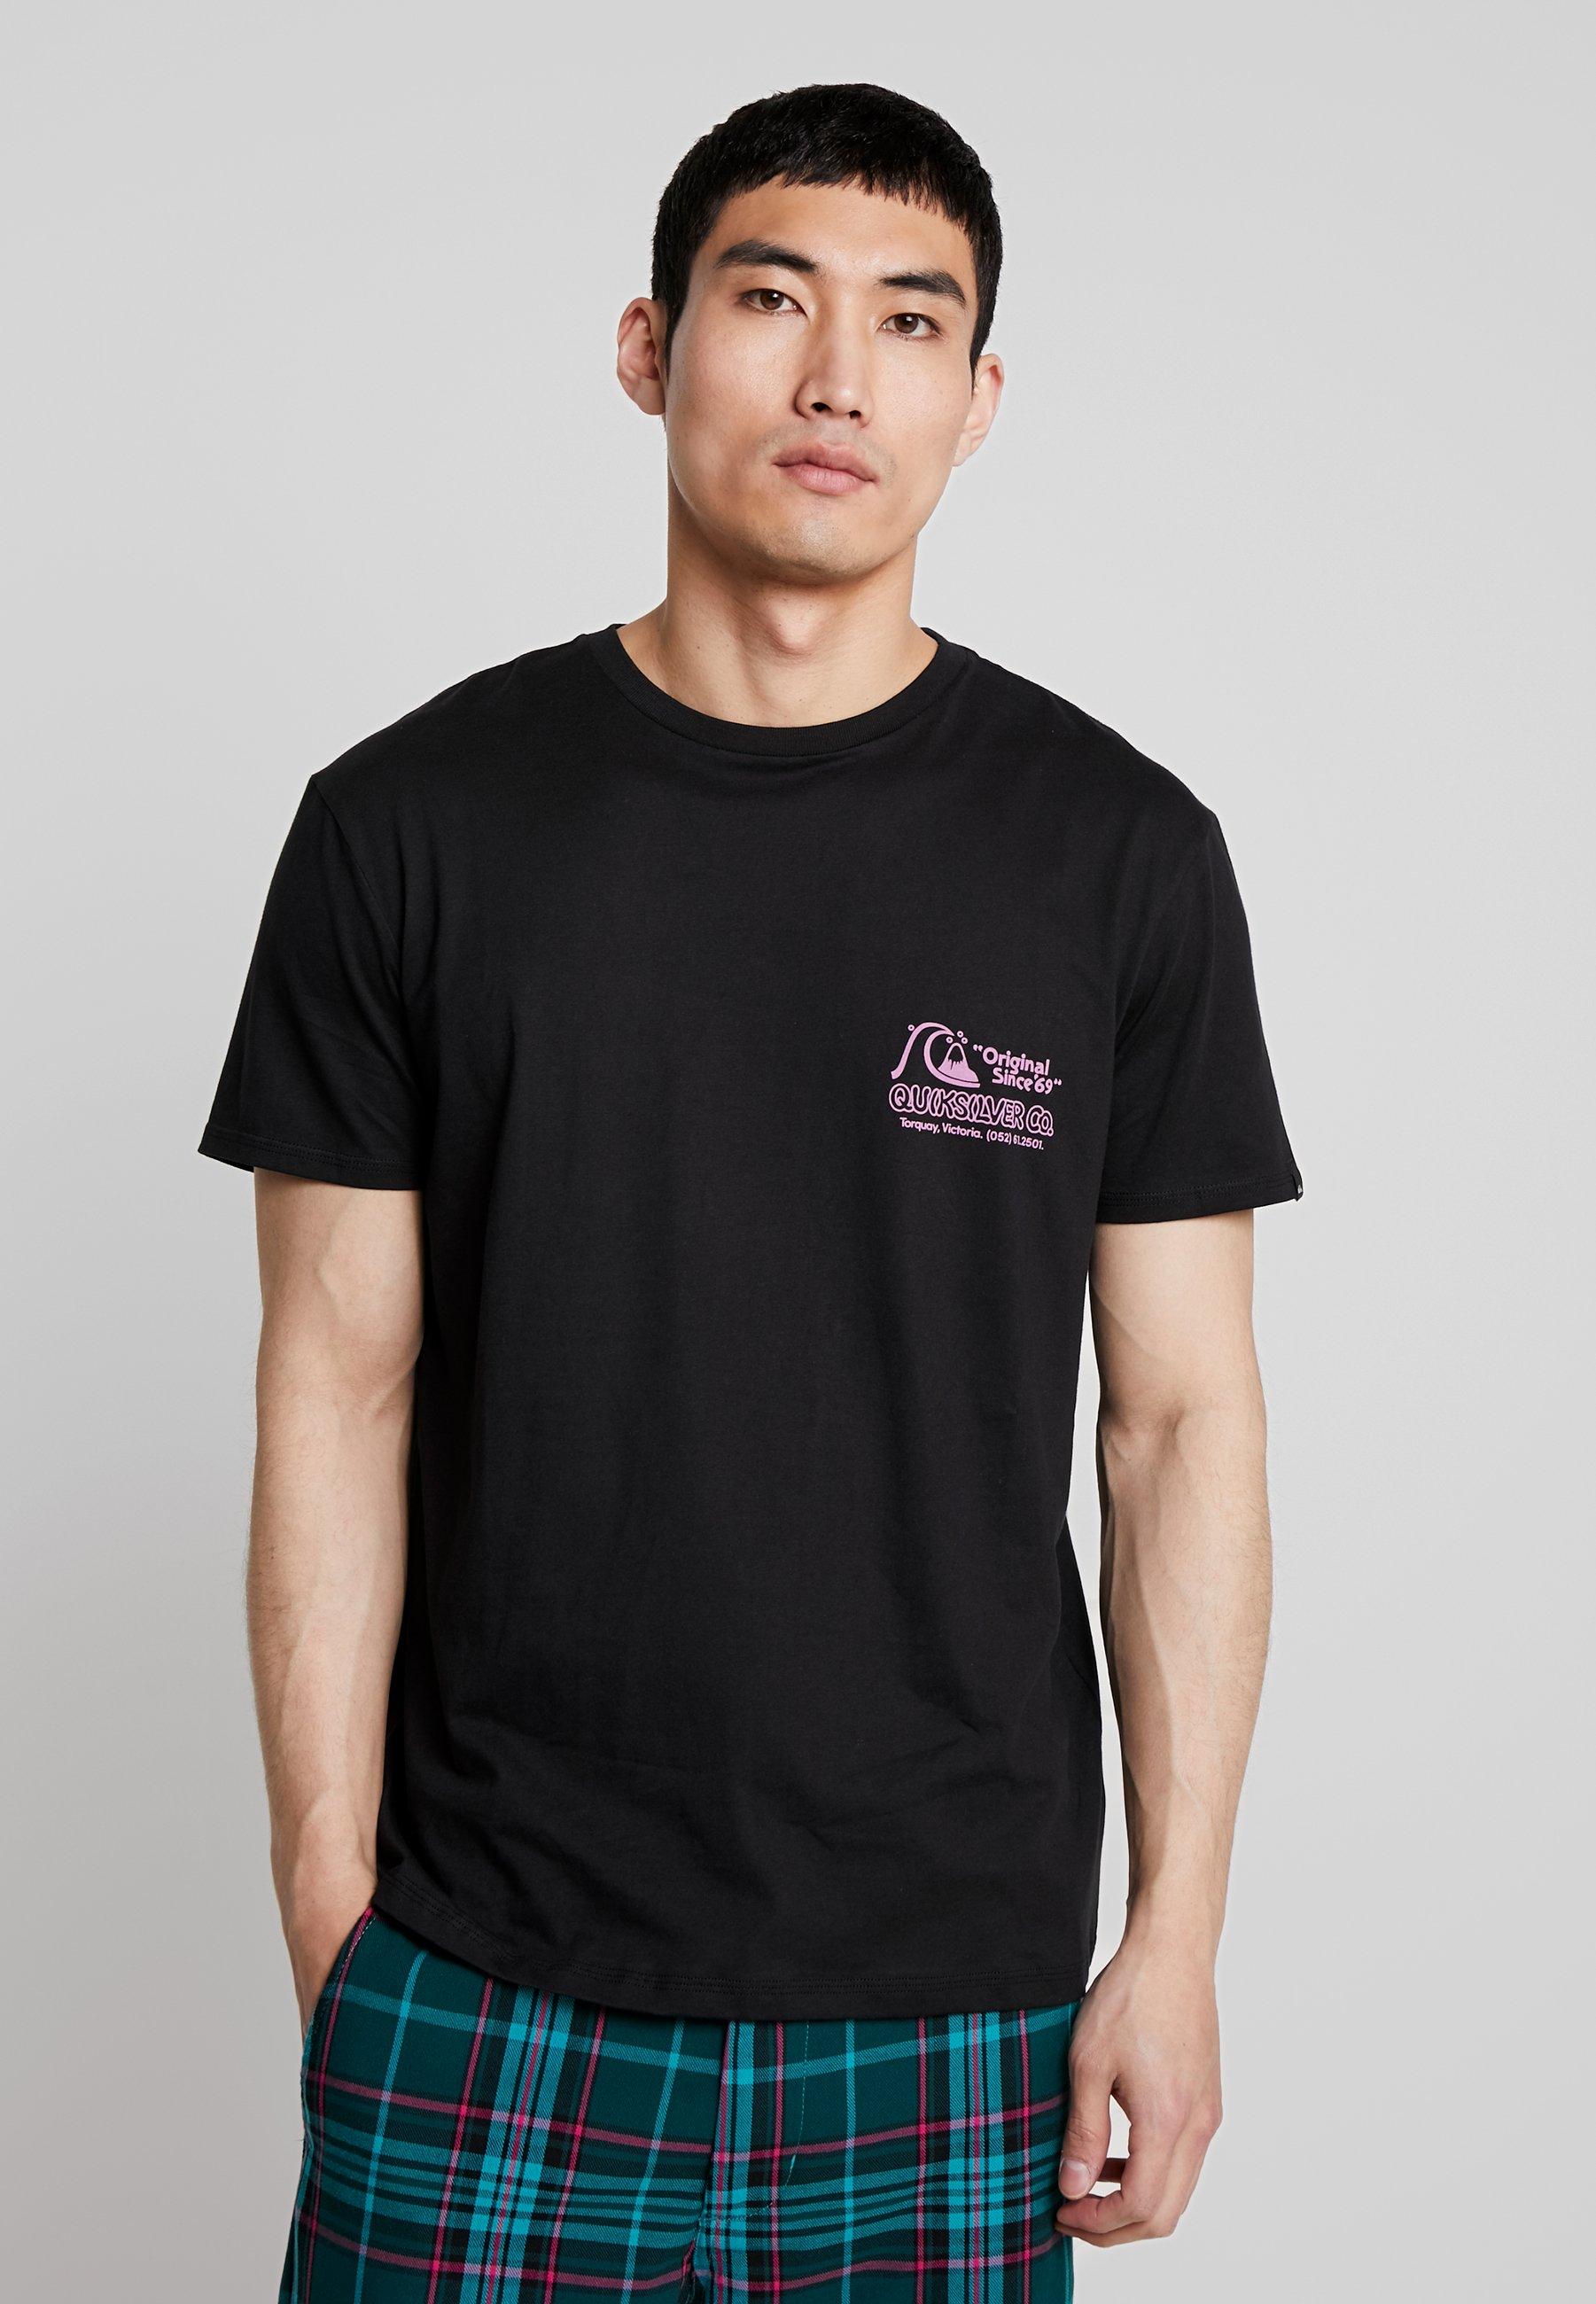 Daily Wax Con Stampa Quiksilver TeeT Black shirt BdCxorQWe